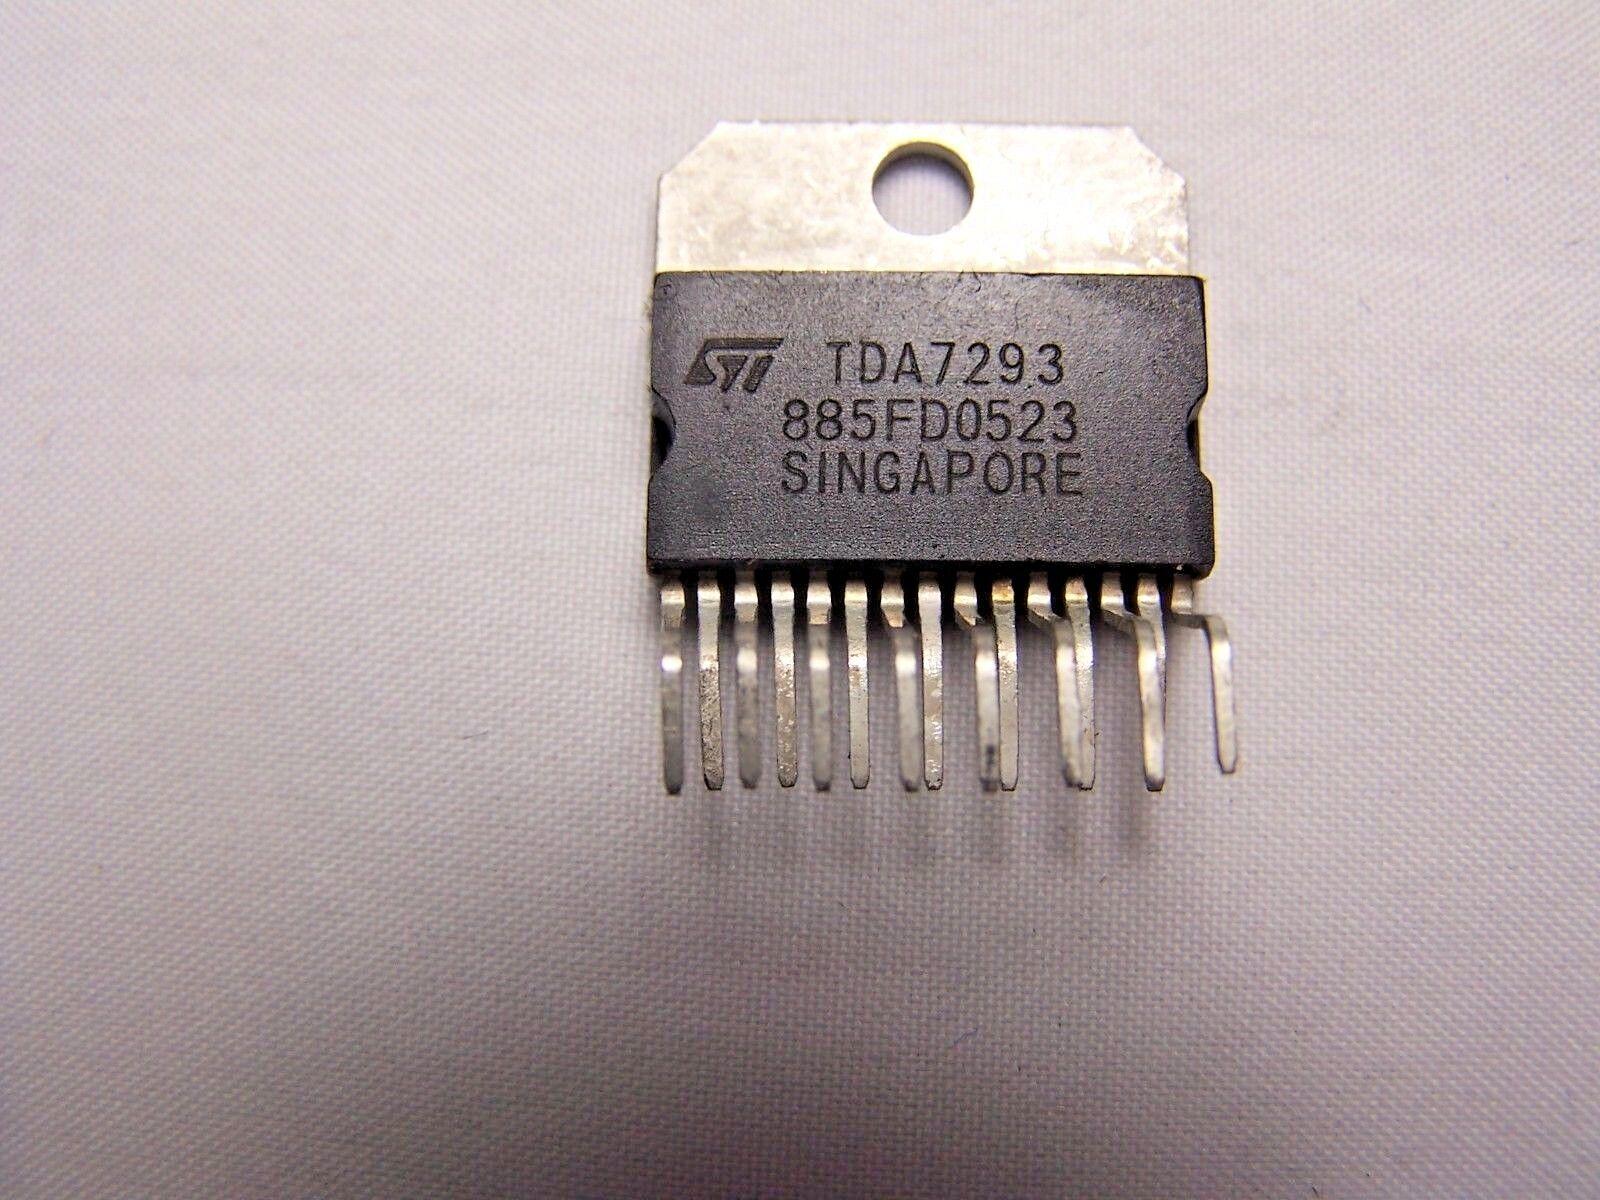 Tda7293 120v 100w Dmos Audio Amplifier With Mute St Ecg 186 Ebay Class B 15w By Ne5532 Transistor Norton Secured Powered Verisign